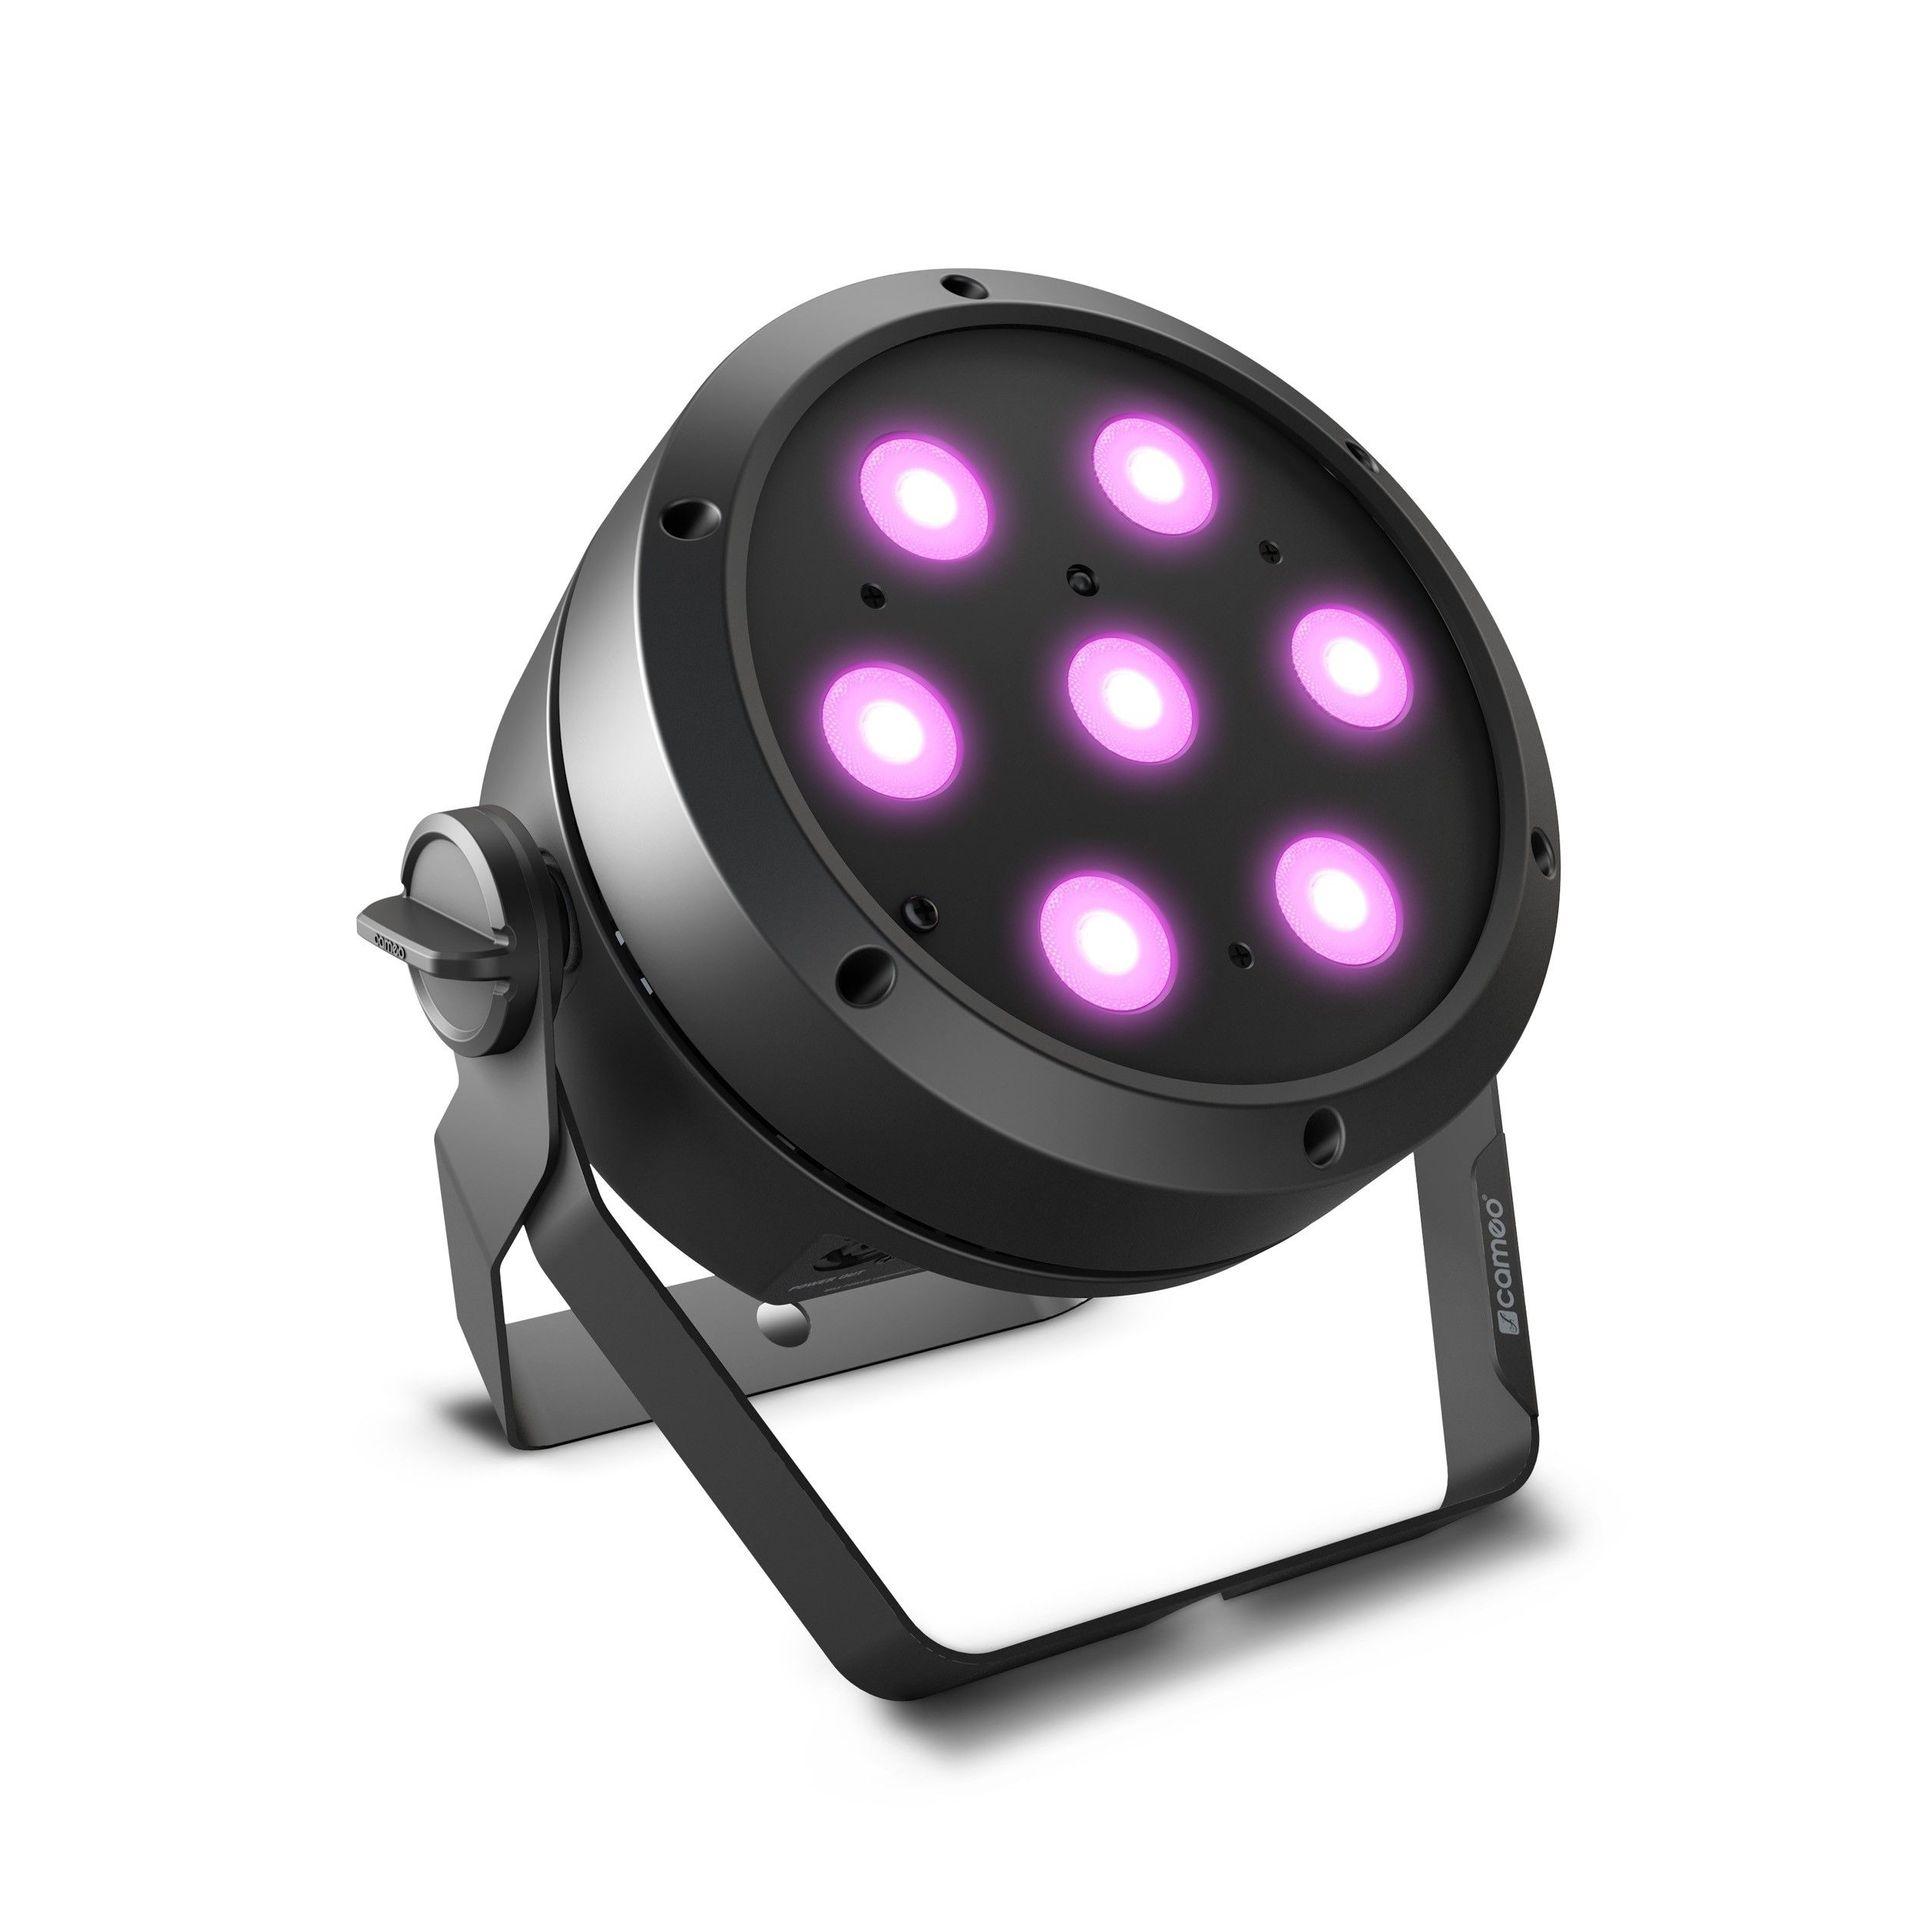 Cameo ROOT PAR 4 schwarz   7 x 4 W RGBW LED PAR Scheinwerfer